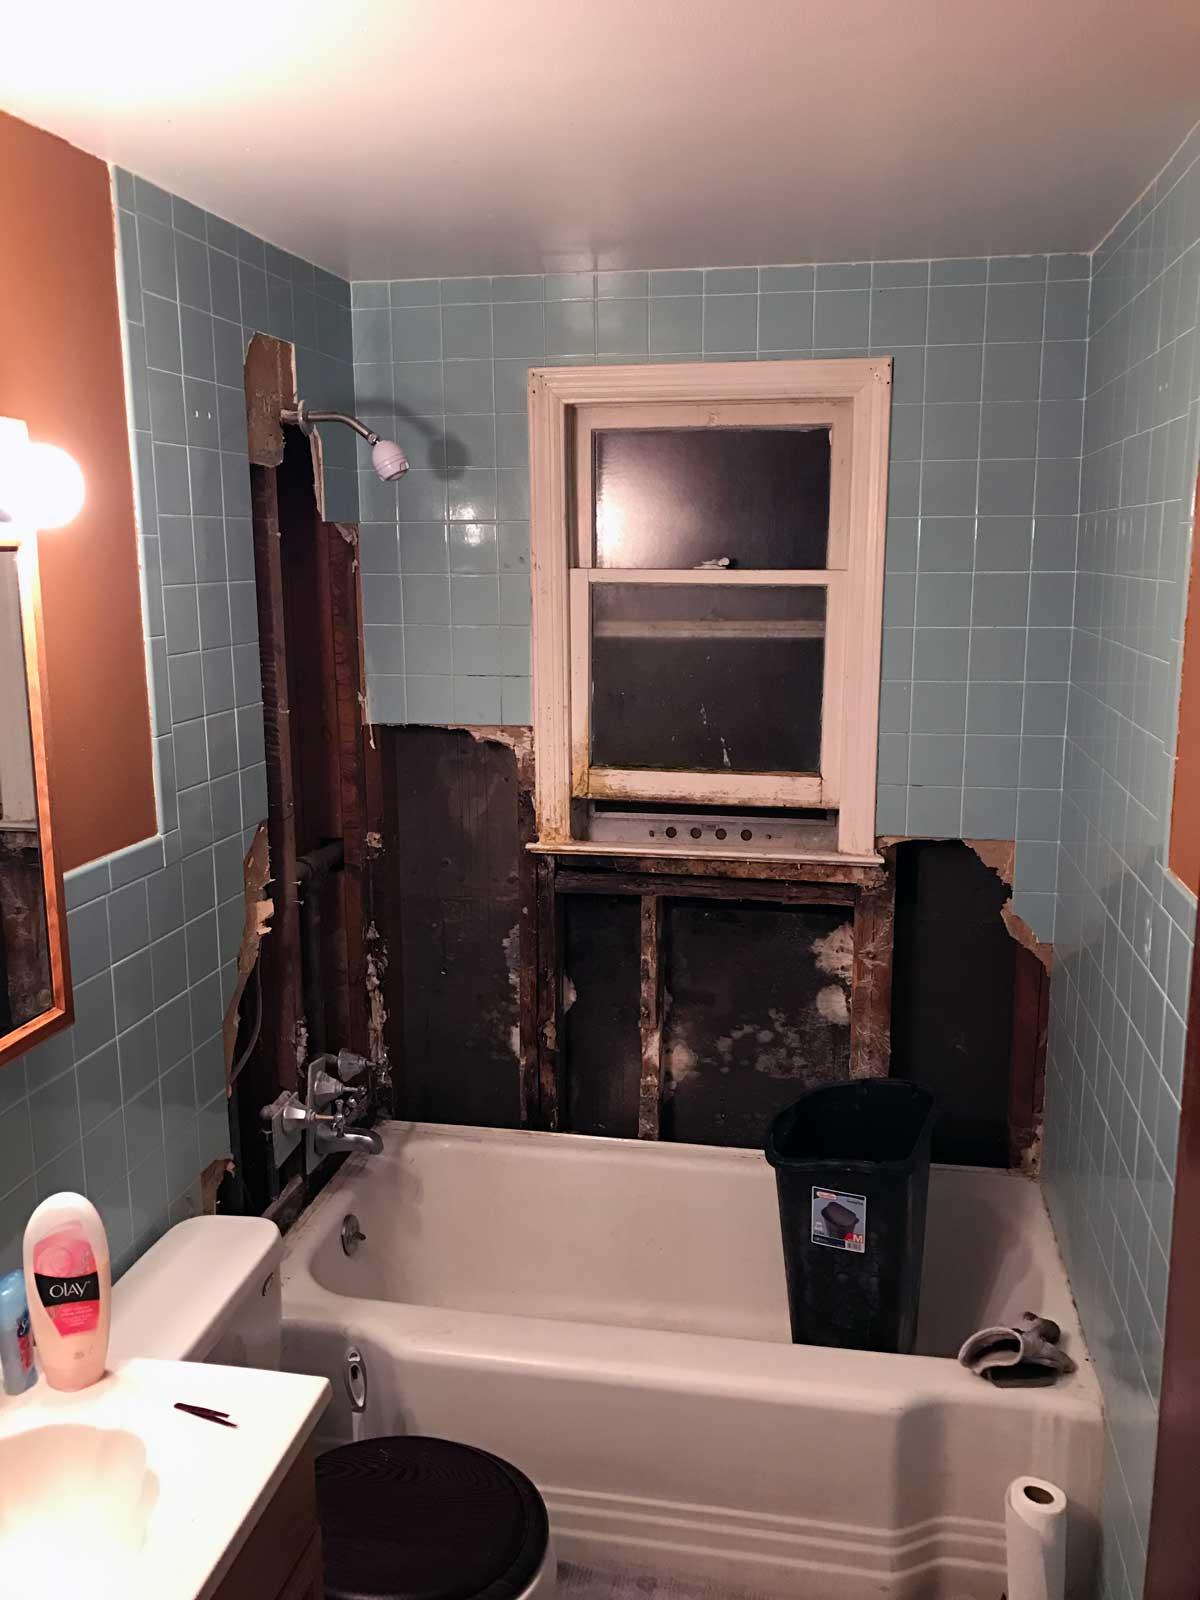 15-Day-Bathroom-Renovation-04.jpg